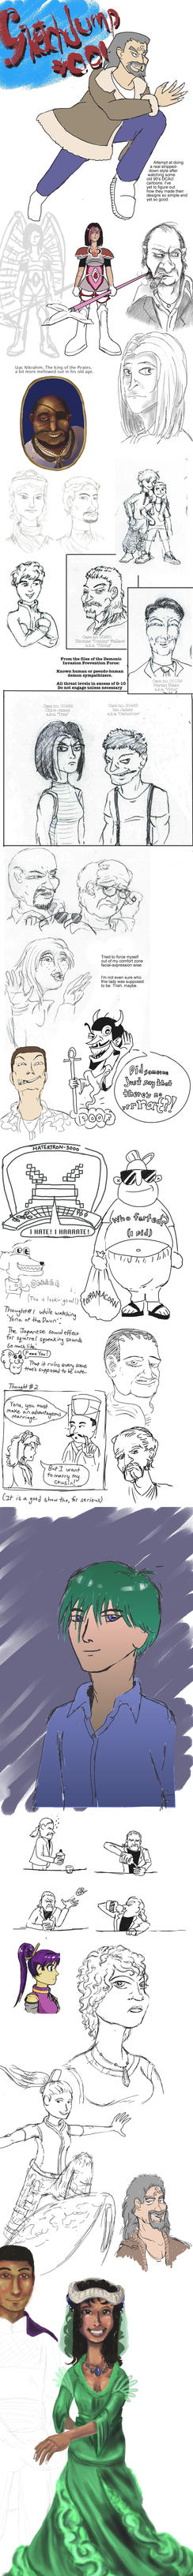 March 2015 Sketchdump by FieldsOfFire